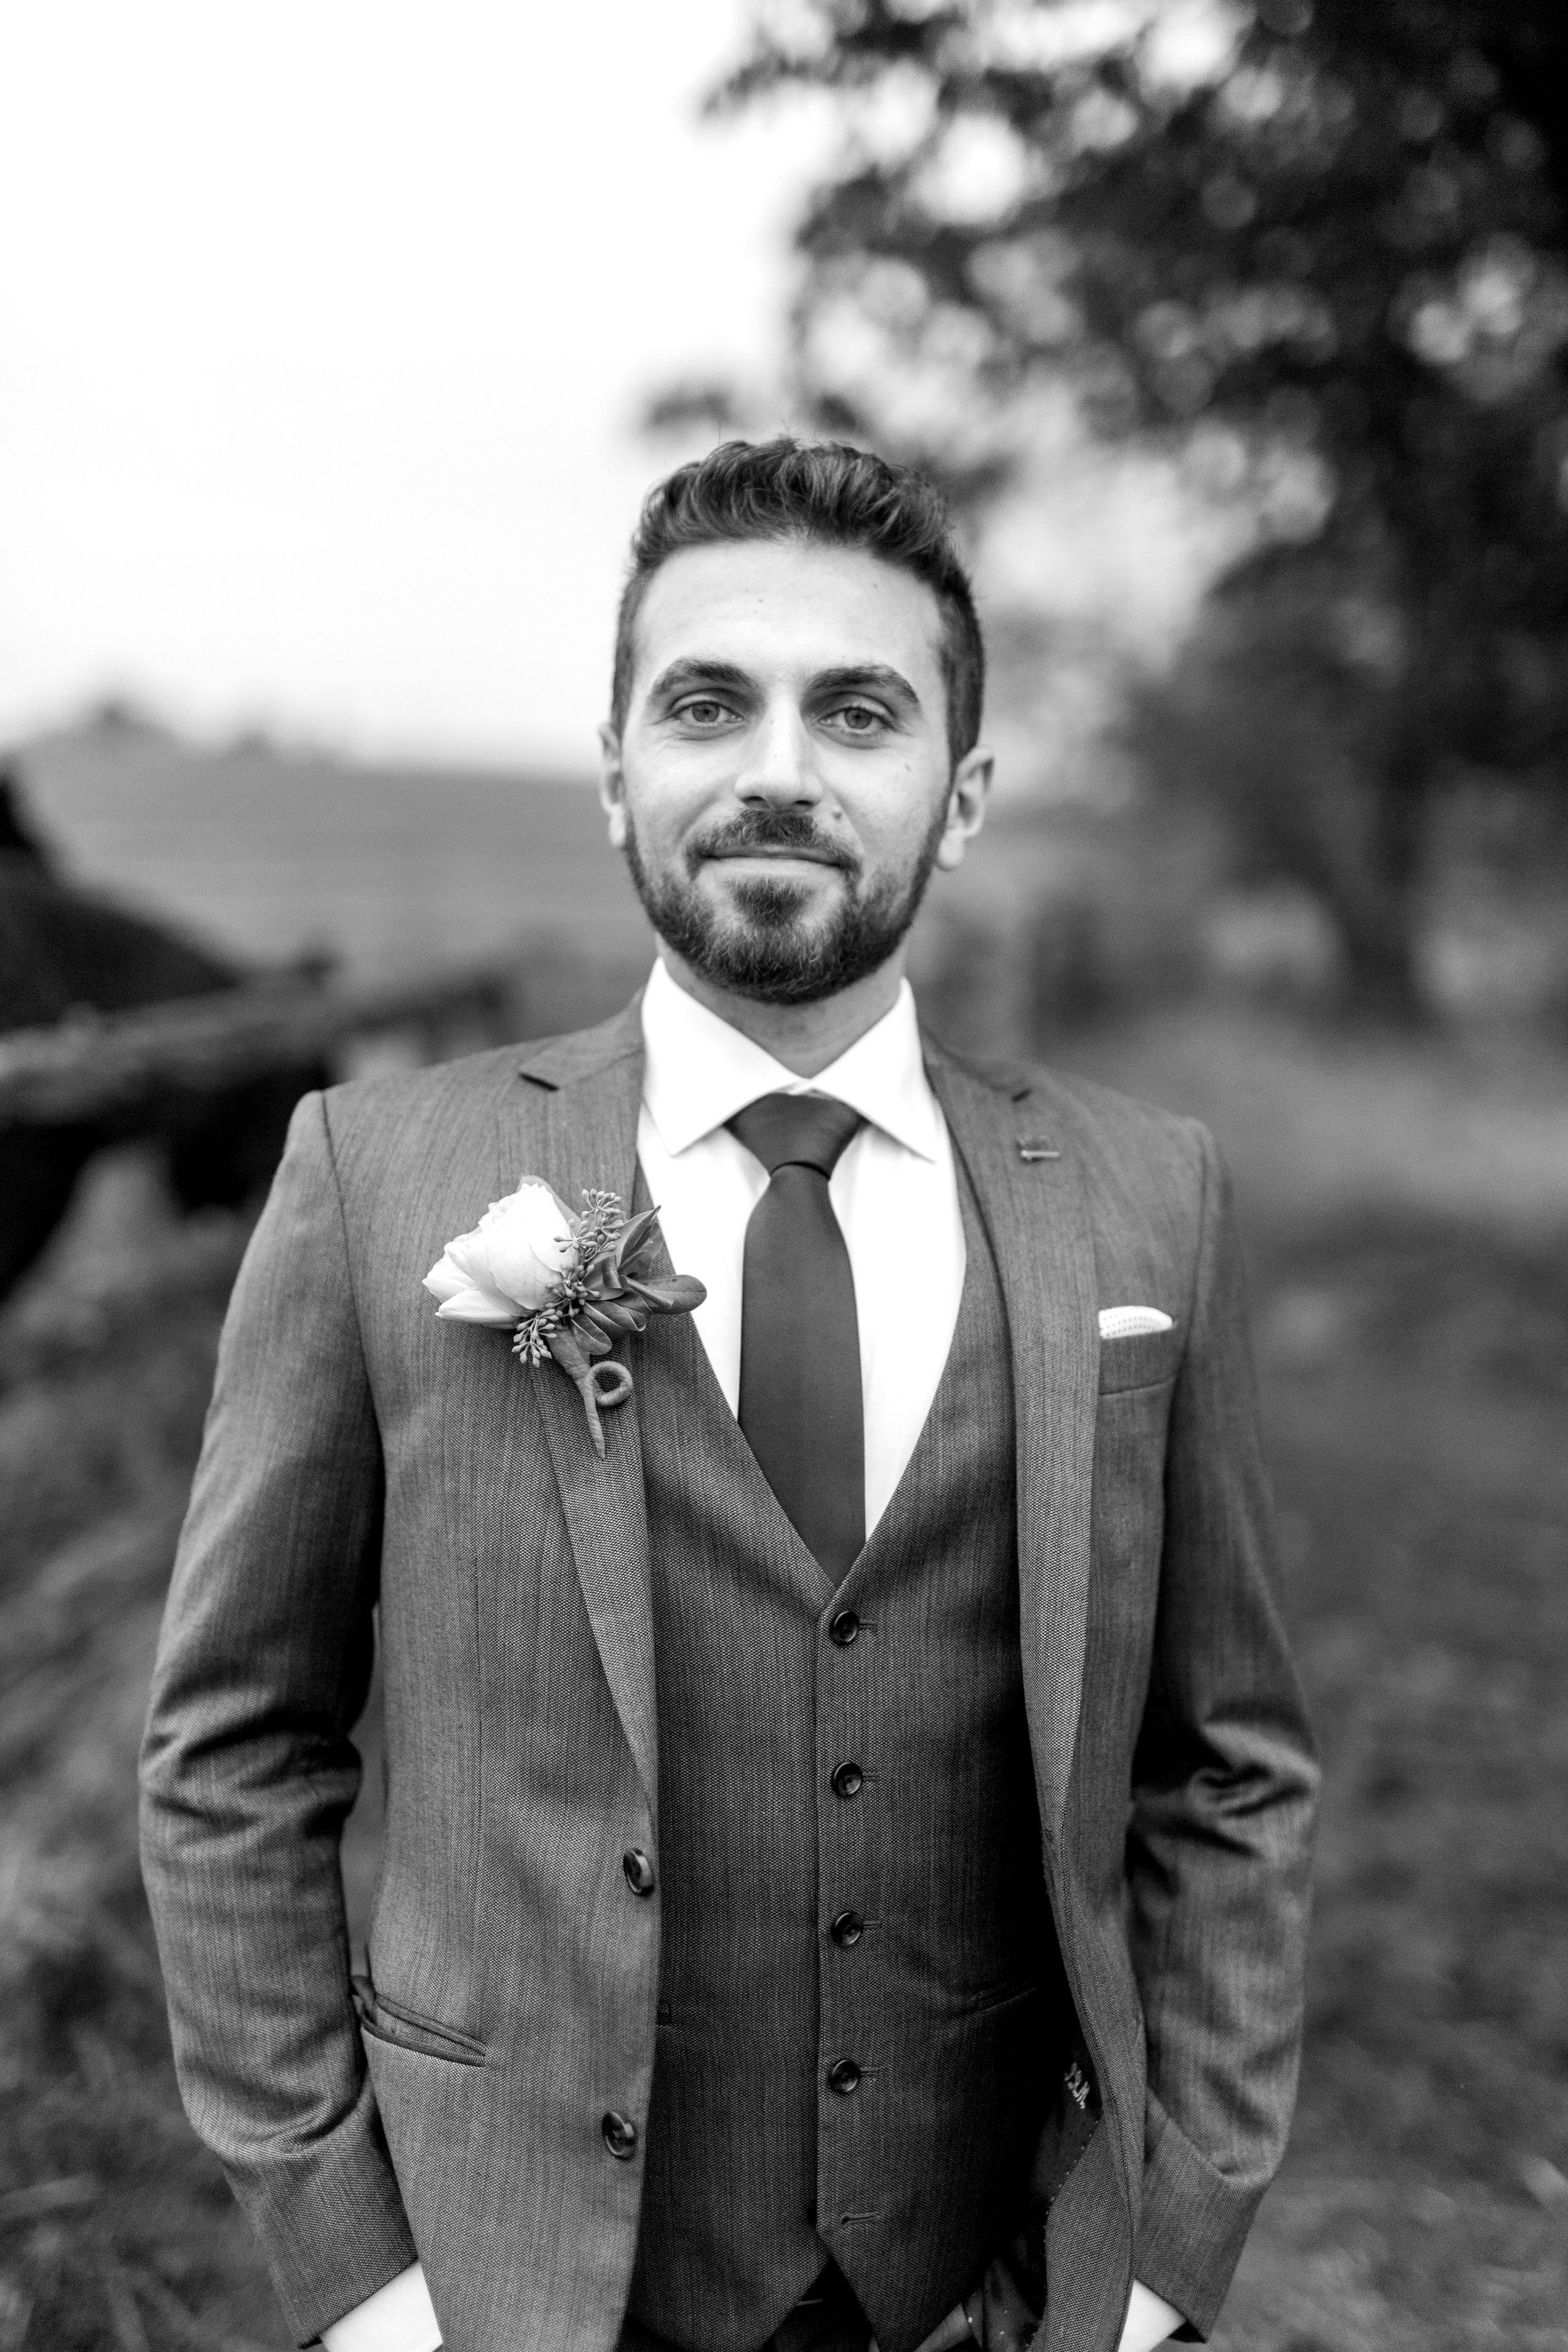 Amir-Golbazi-Danielle-Giroux-Photography_Toronto-Wedding_Cedarwood_Rachel-Paul_552.jpg